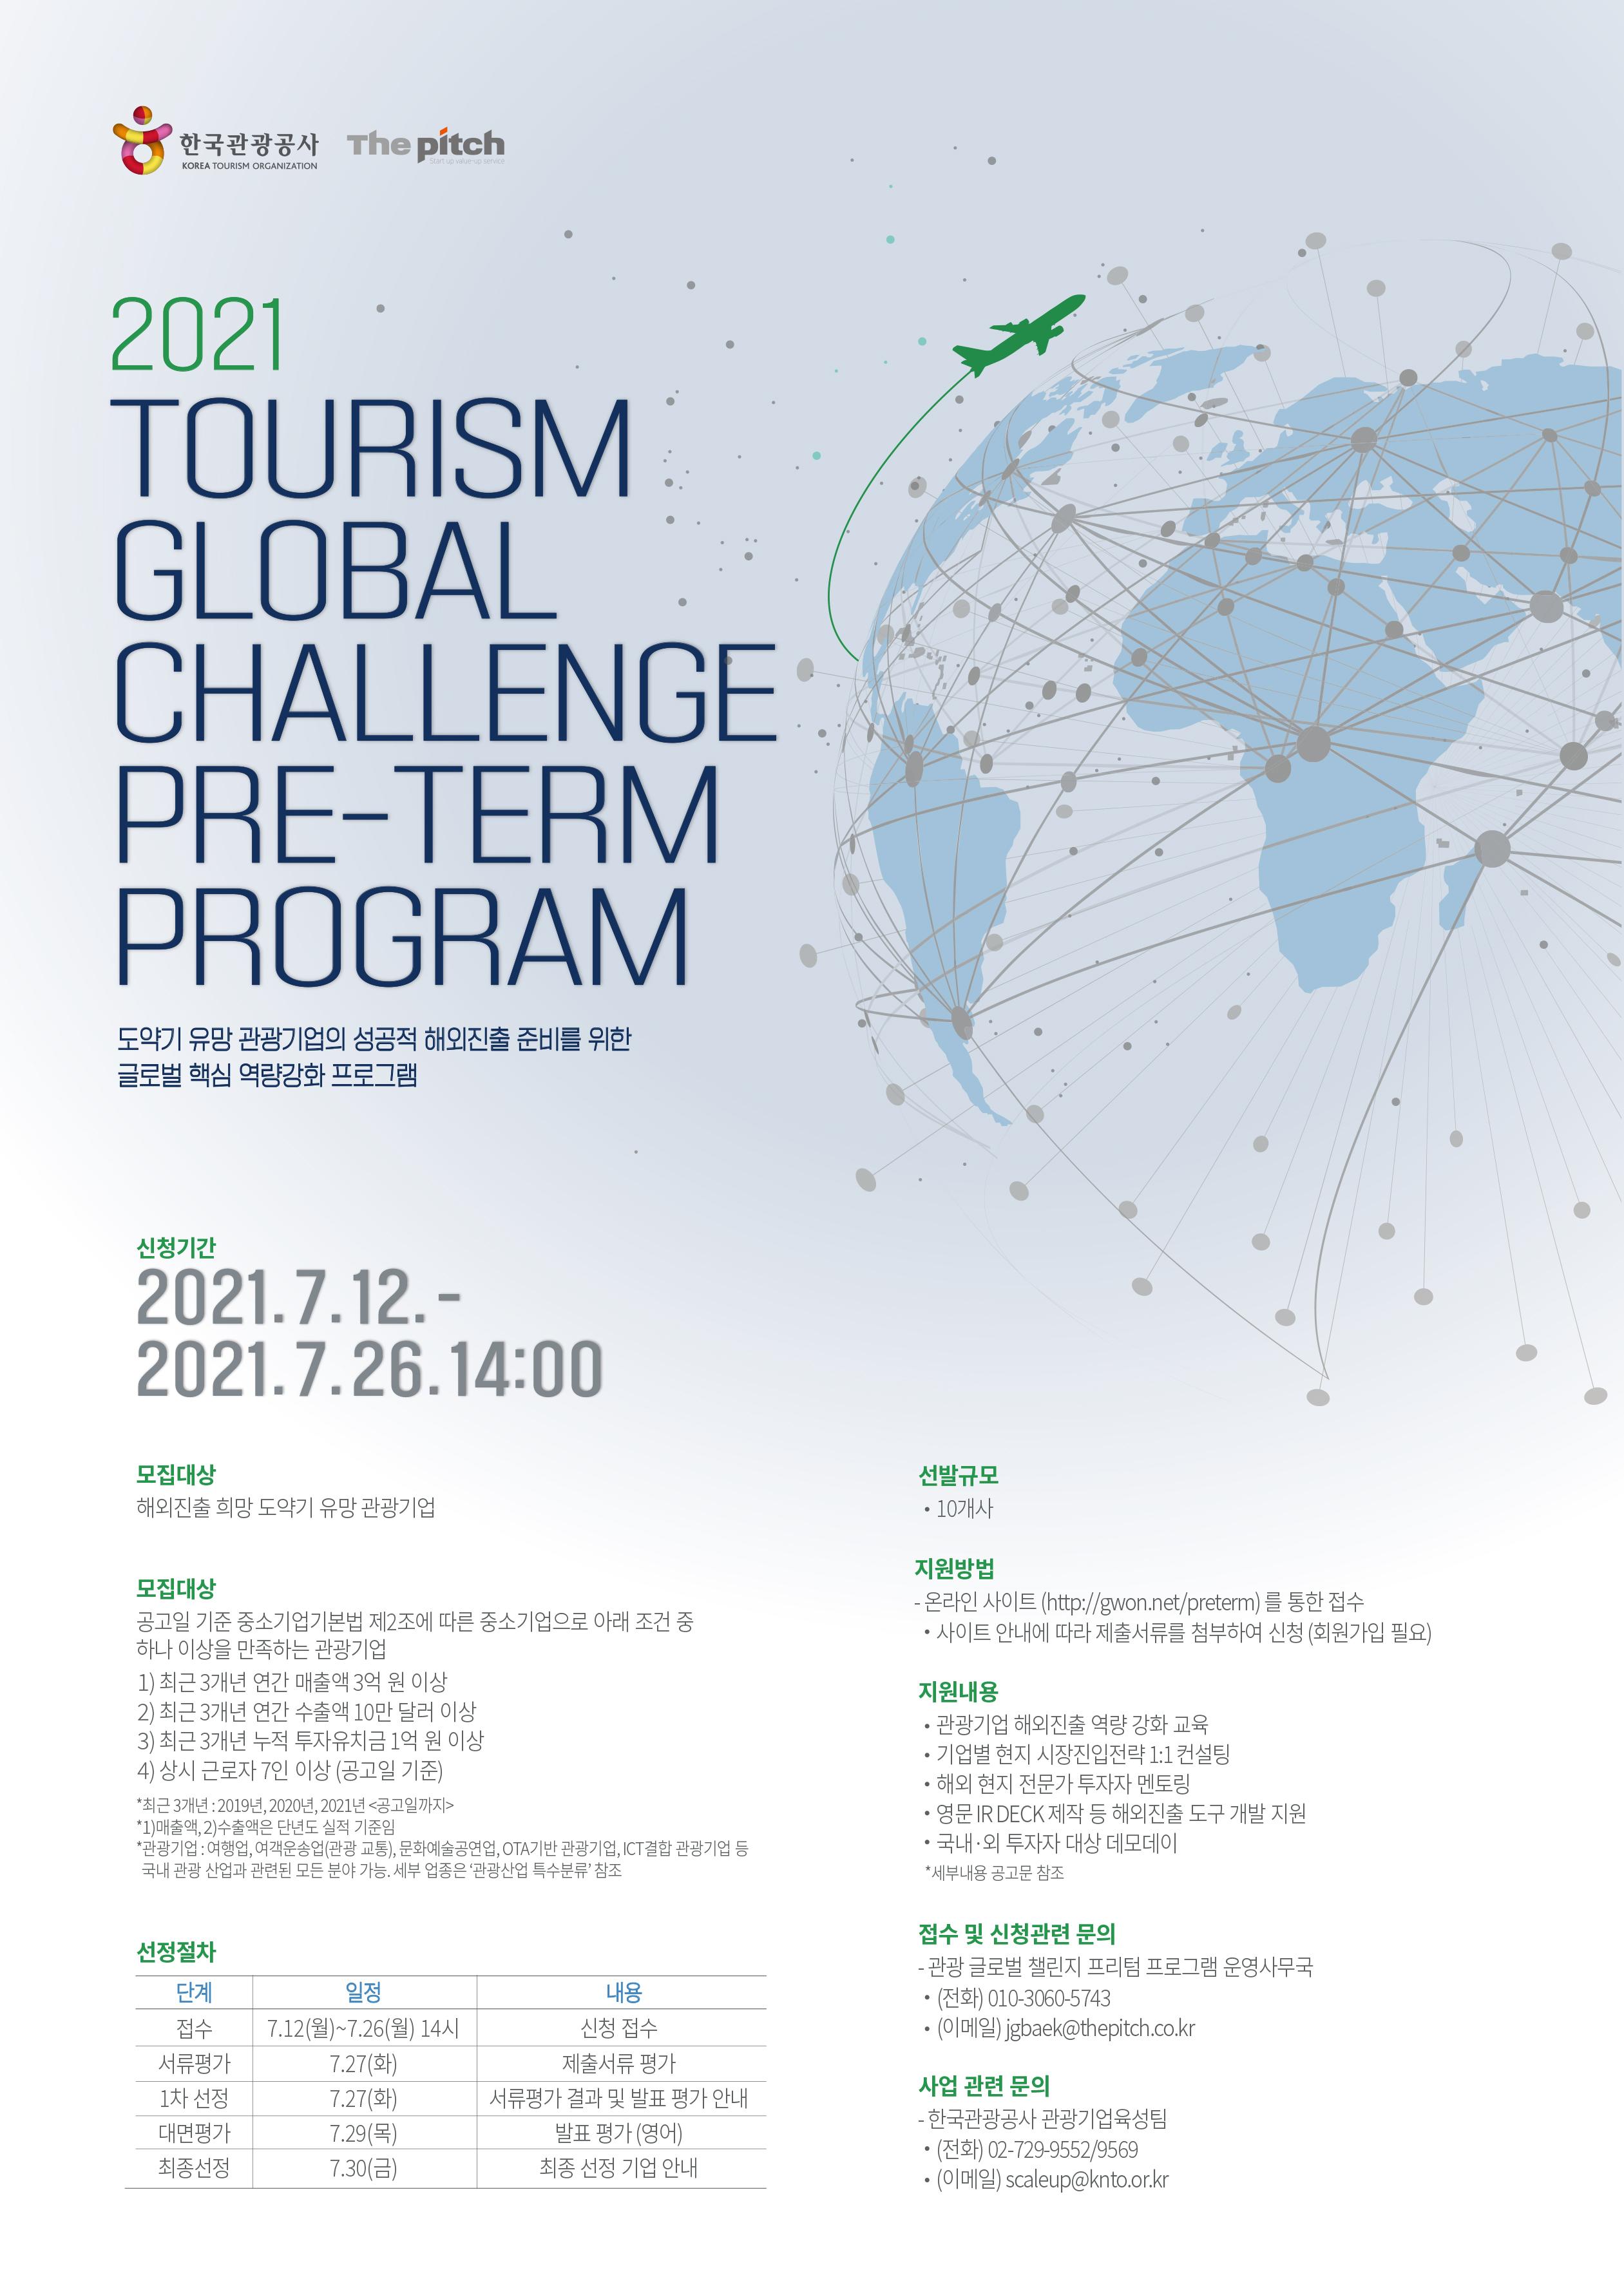 2021 Tourism Global Challenge Pre-Term Program(도약기 유망 관광기업의 성공적 해외진출 준비를 위한 글로벌 핵심 역량강화 프로그램) - 한국관광공사, The pitch